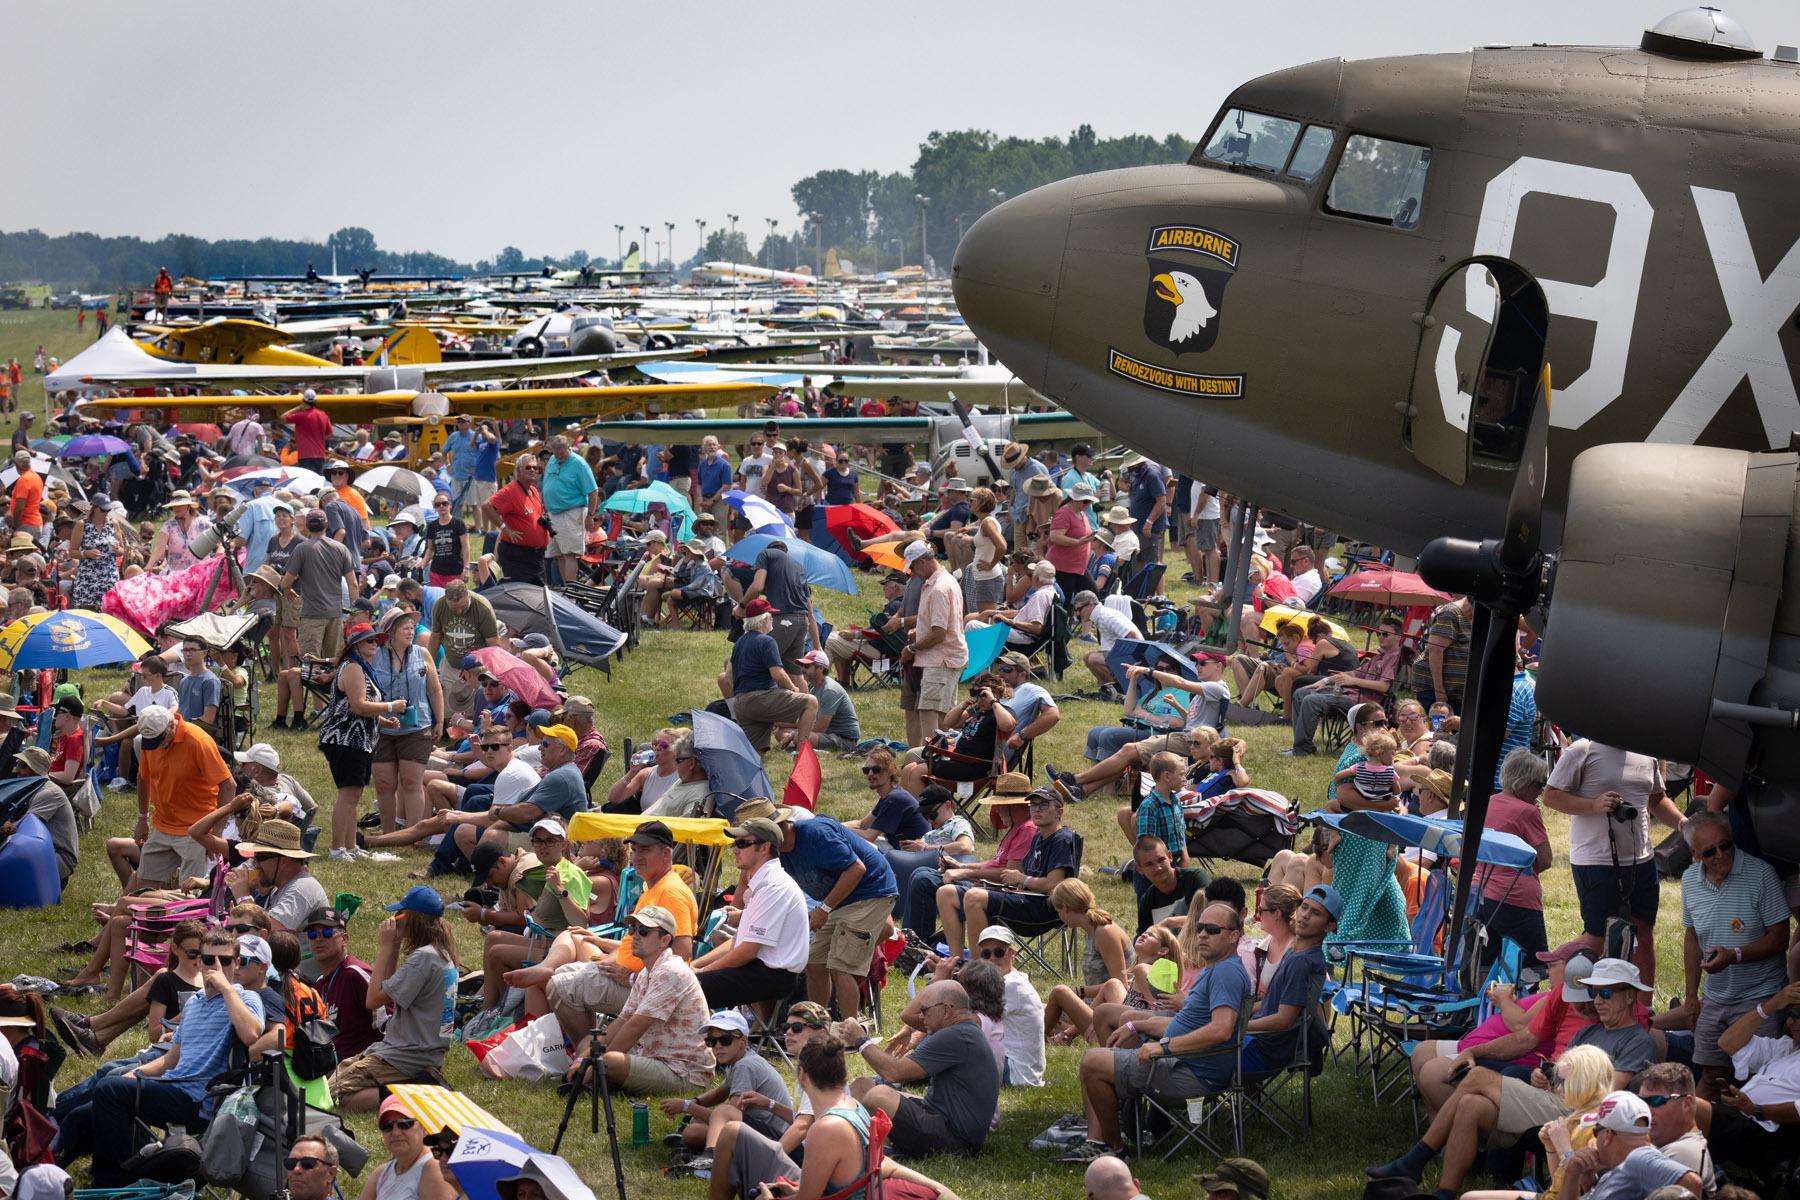 Air show Crowd by Jim Koepnick